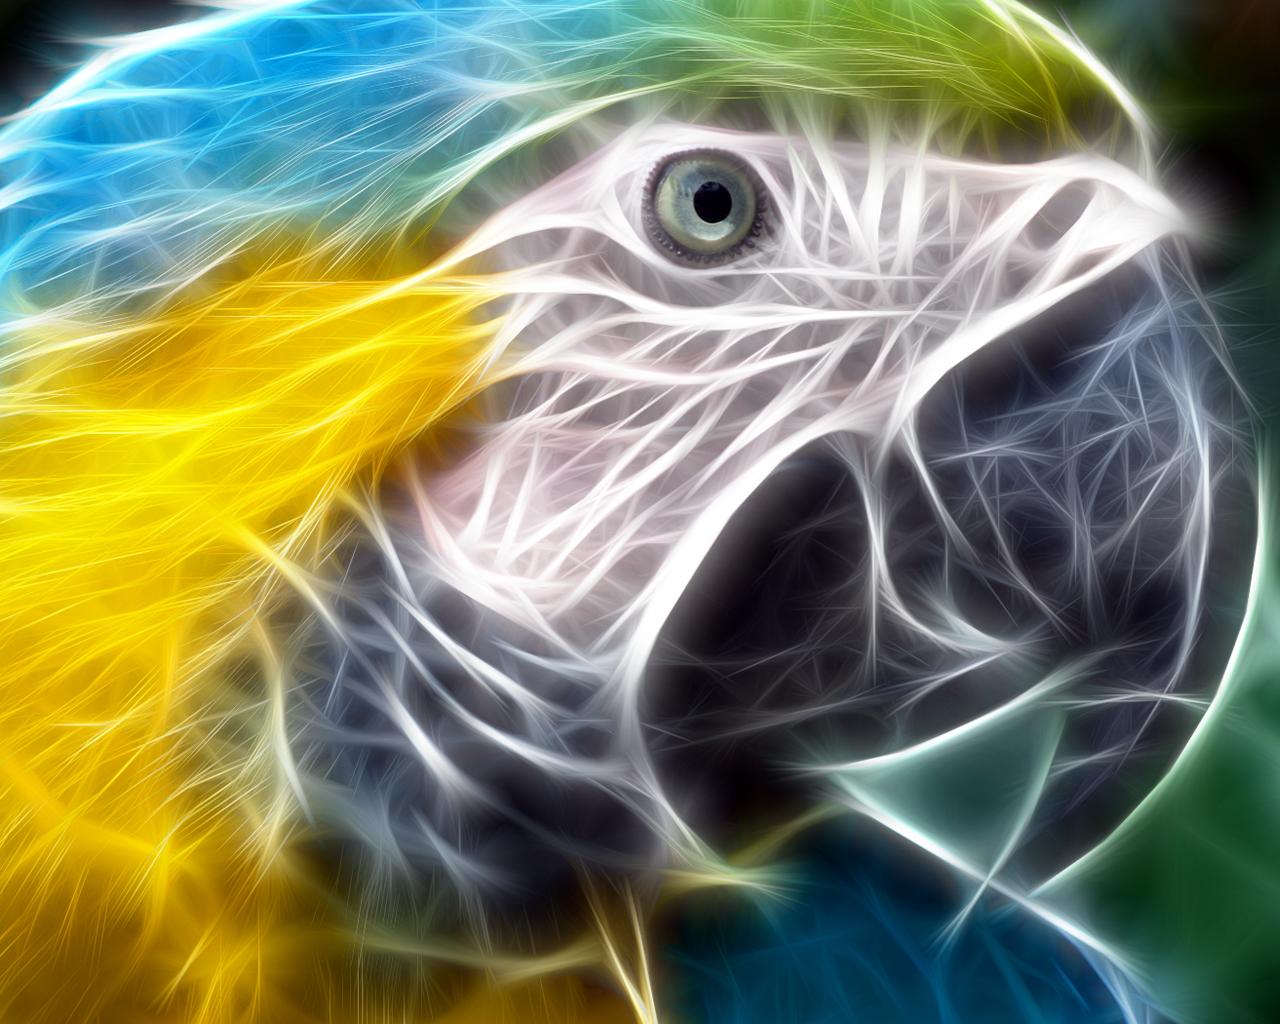 3d animaux iwallpapers 29 10 000 fonds d 39 cran hd for Fond ecran animaux hd